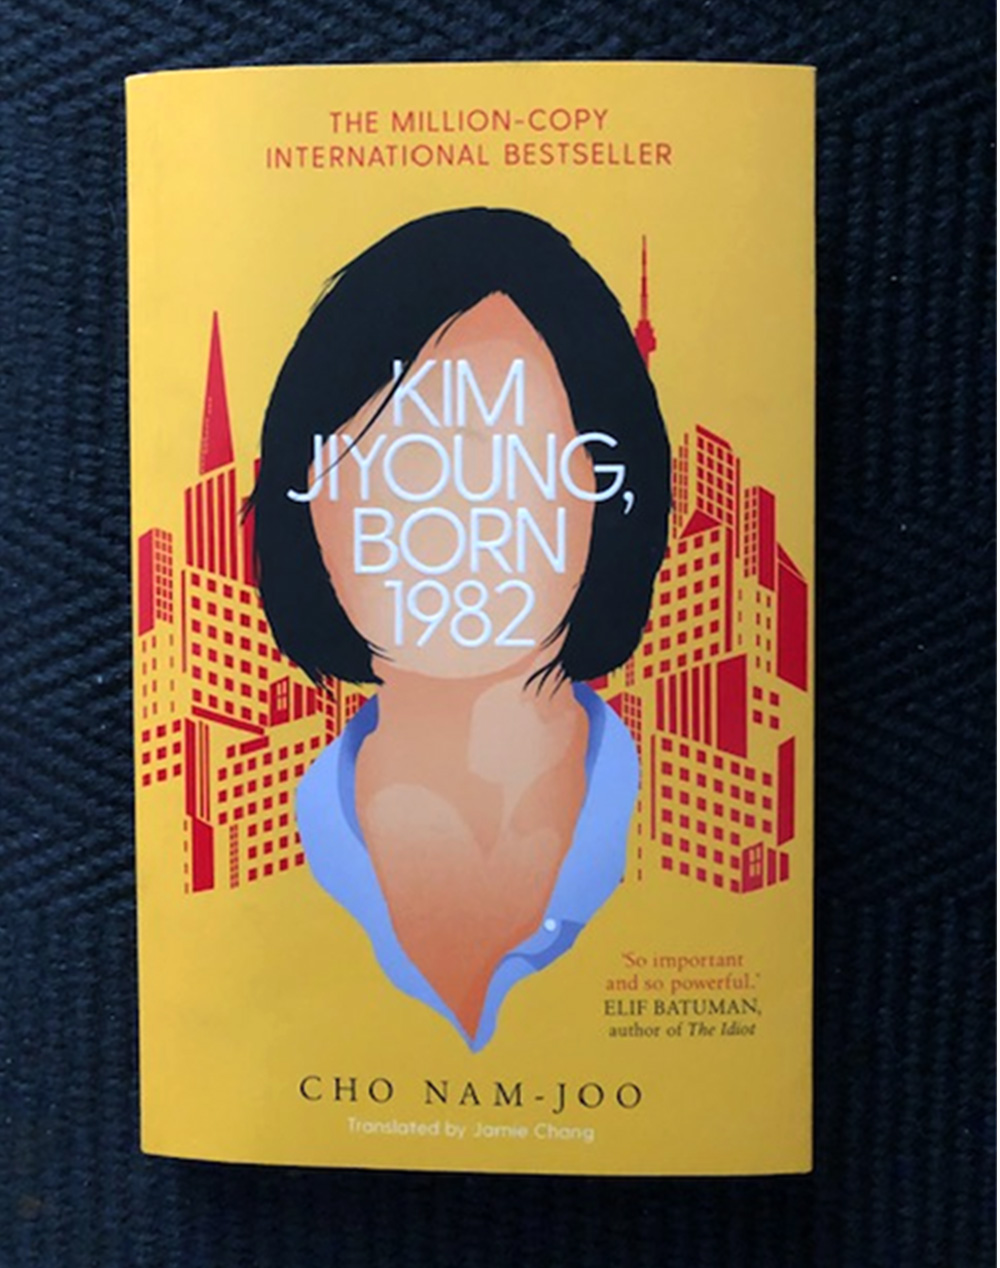 Kim Jiyoung Born 1982 by Cho Nam-Joo